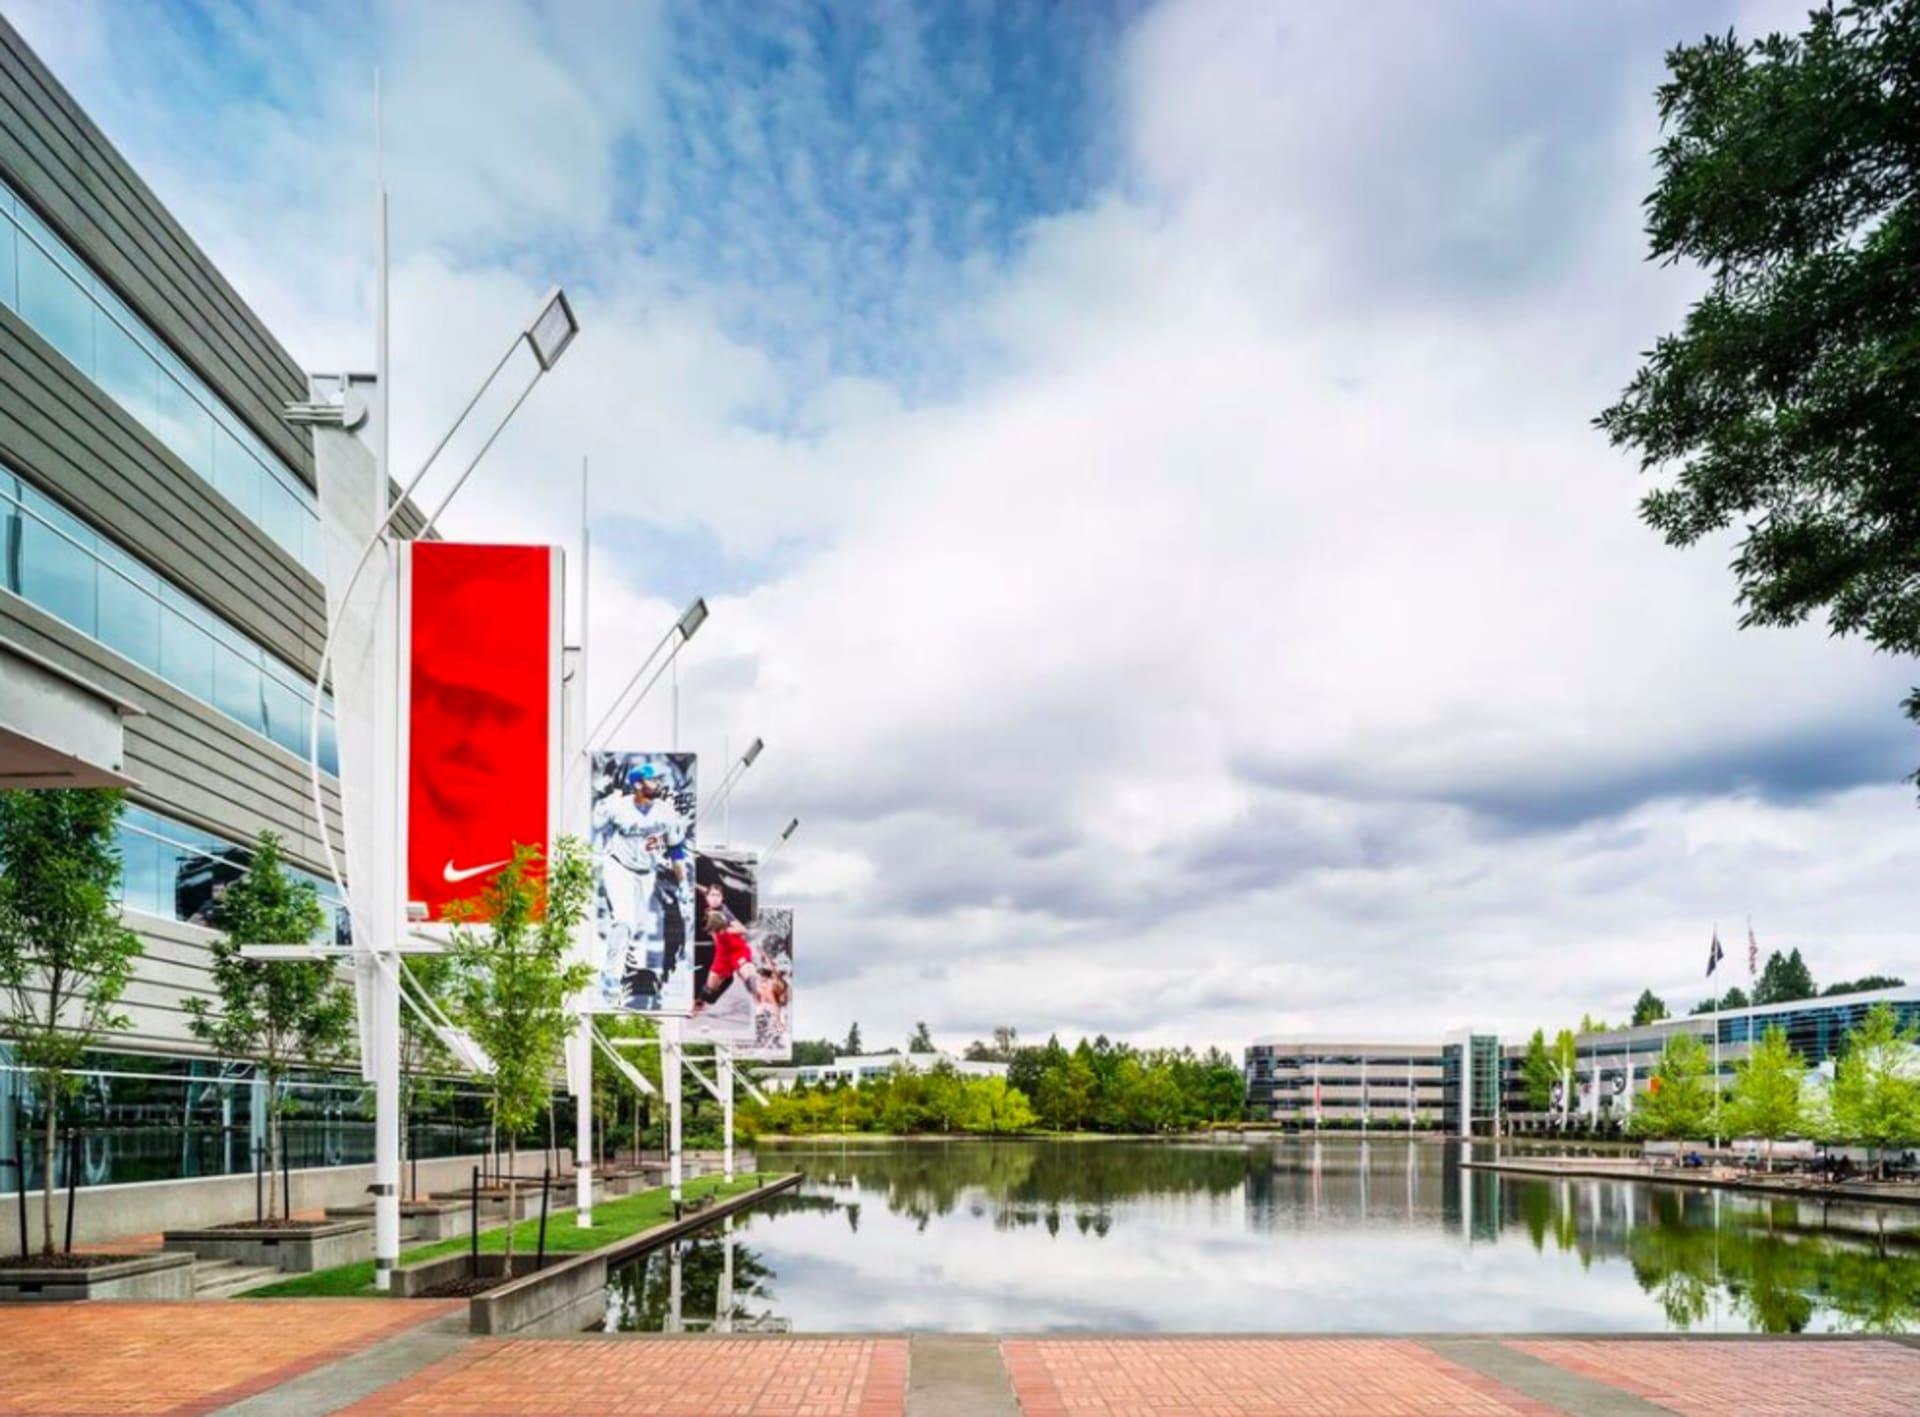 Nike's Look An Inside Oregon In Sprawling Complex Headquarters Depth wqHHnFExI